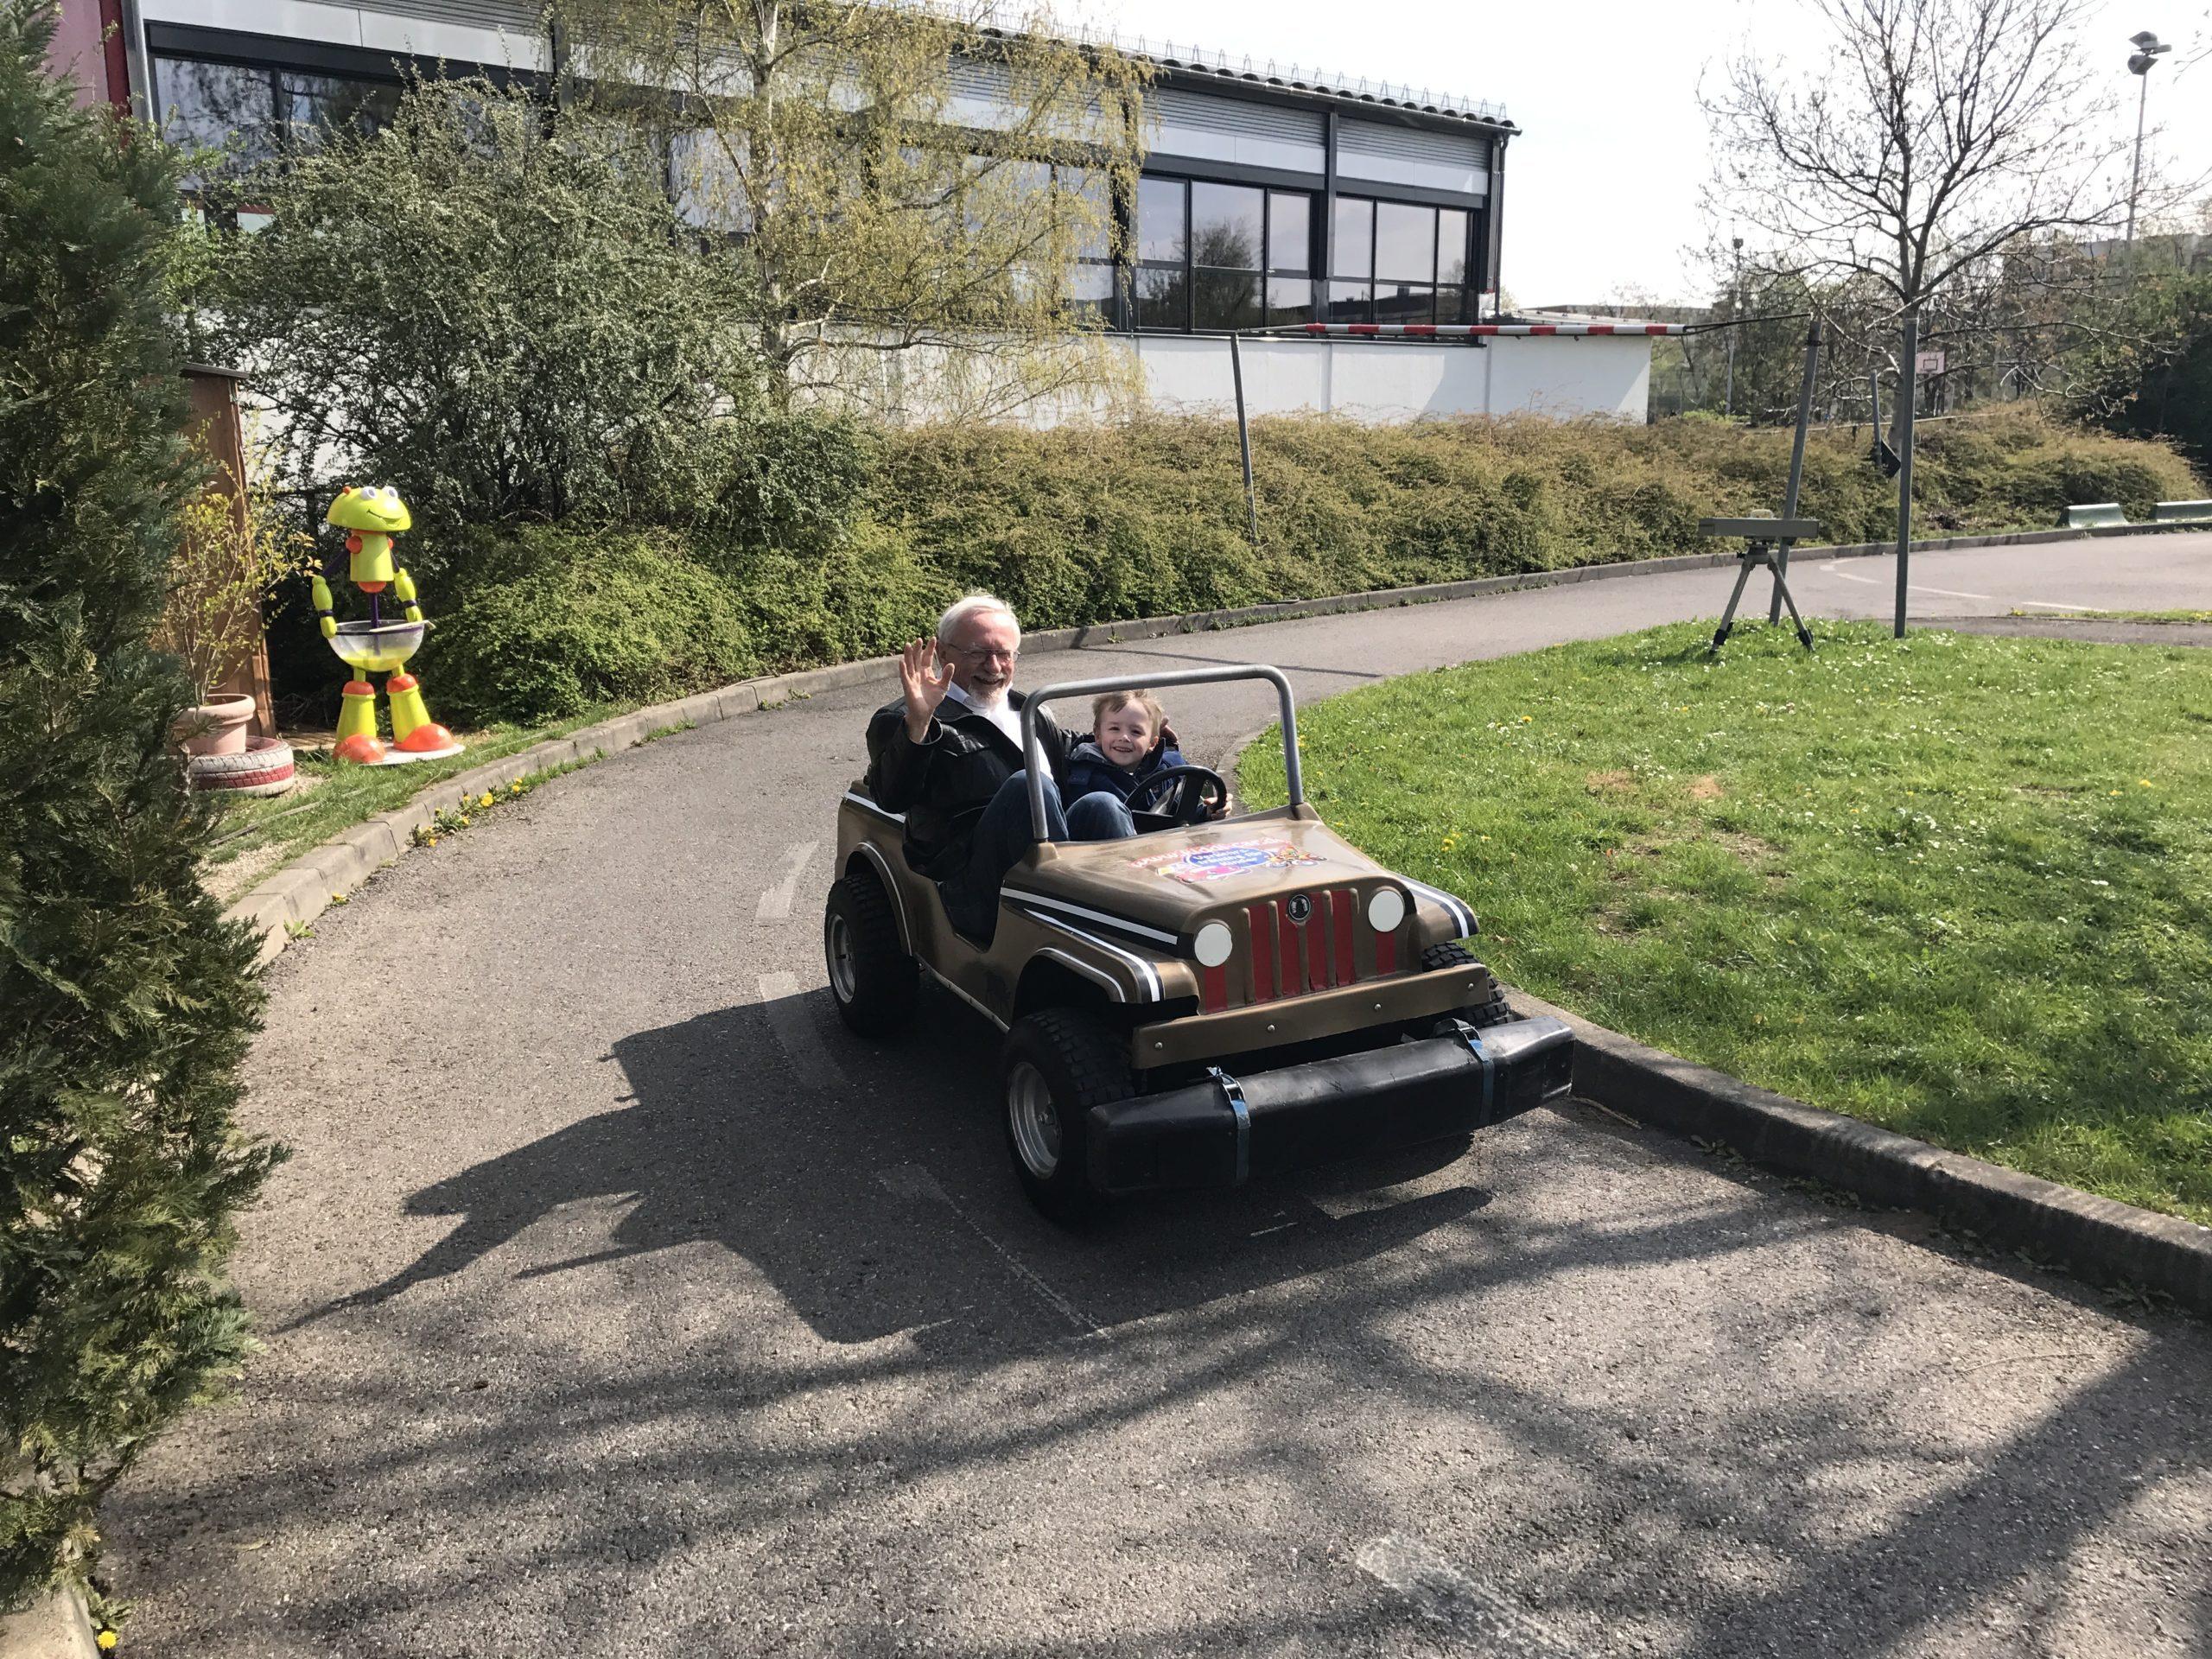 Kiddi-Car Quadfahren Opa und Enkel im Auto bei Kiddi Car scaled